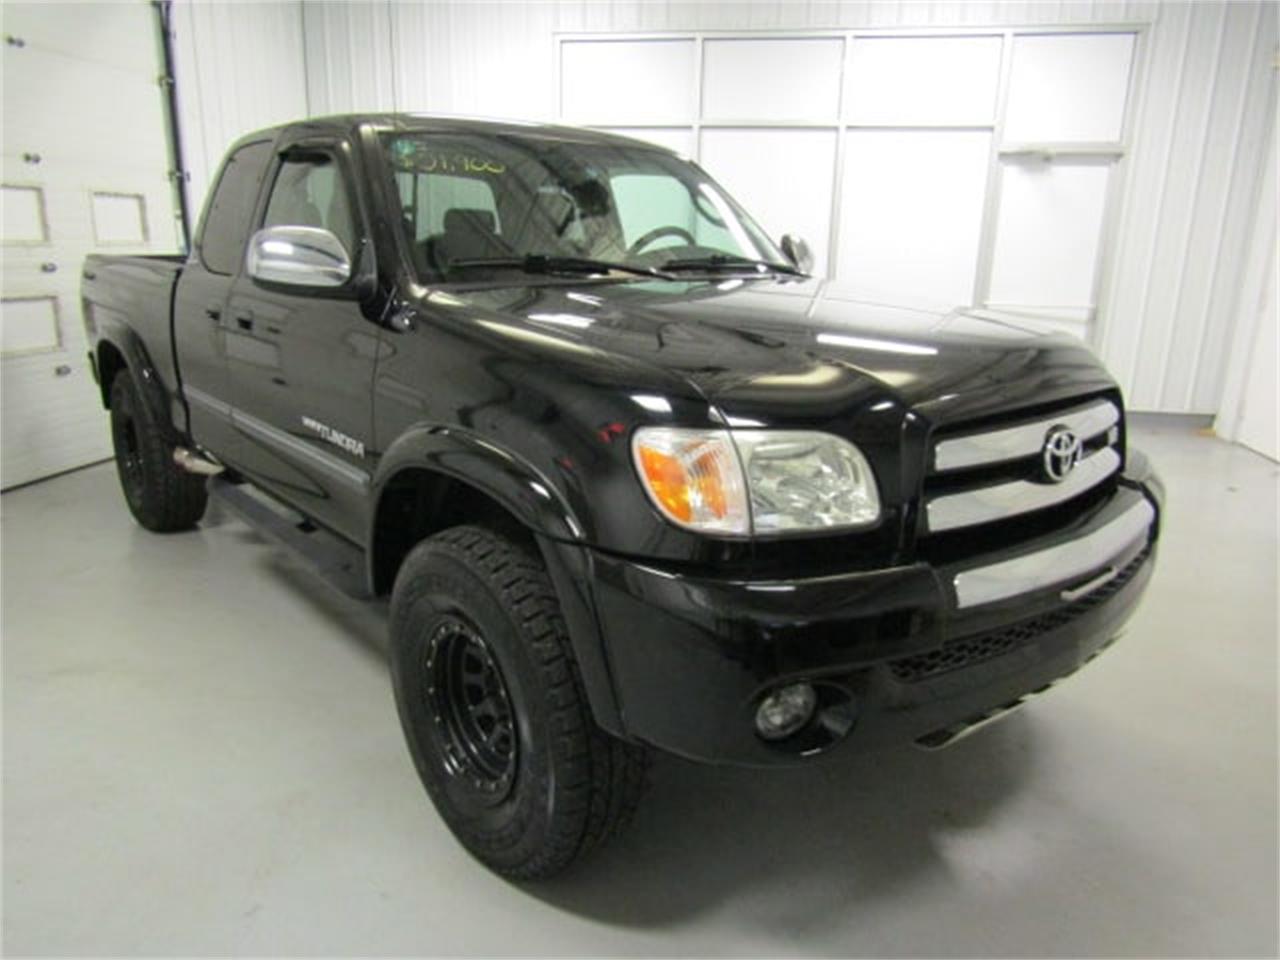 2005 Toyota Tundra For Sale Classiccars Com Cc 1093515